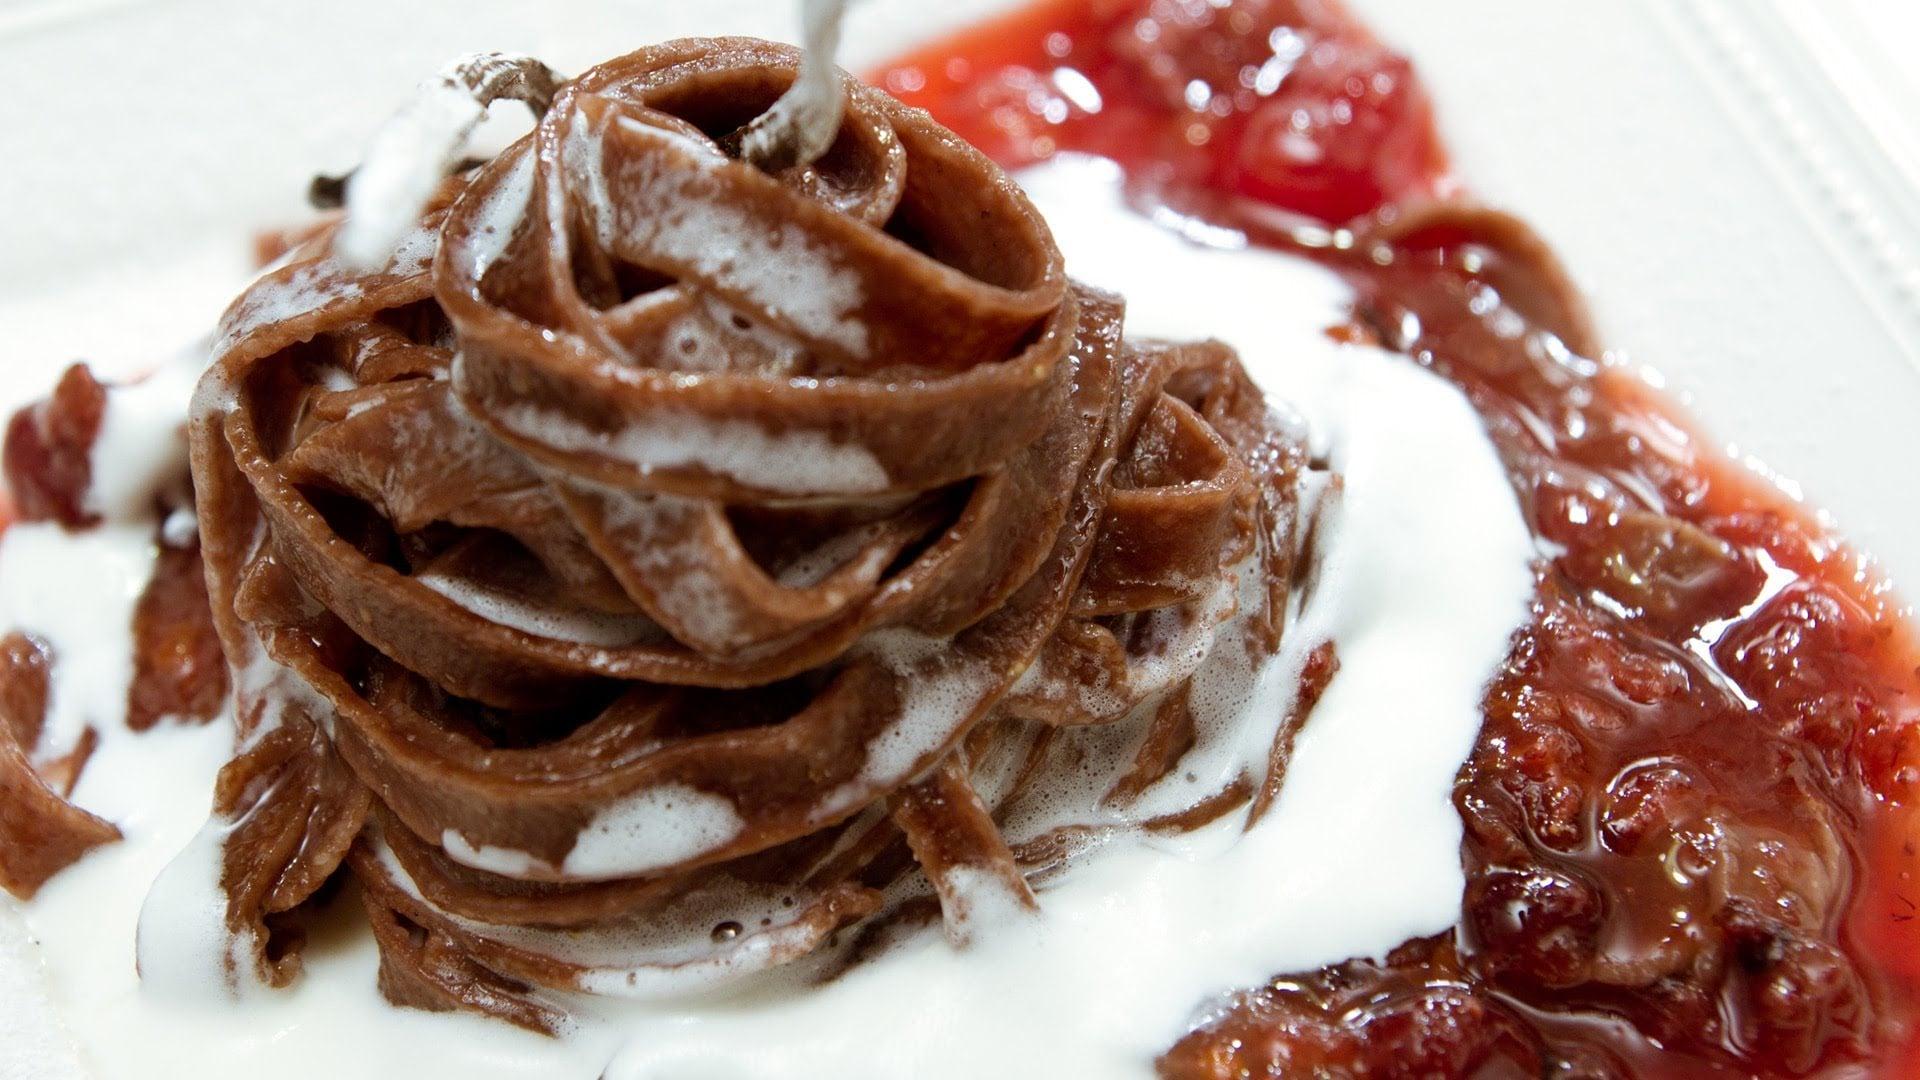 Homemade PASTA and sweet DESSERT! – Mirka van Gils